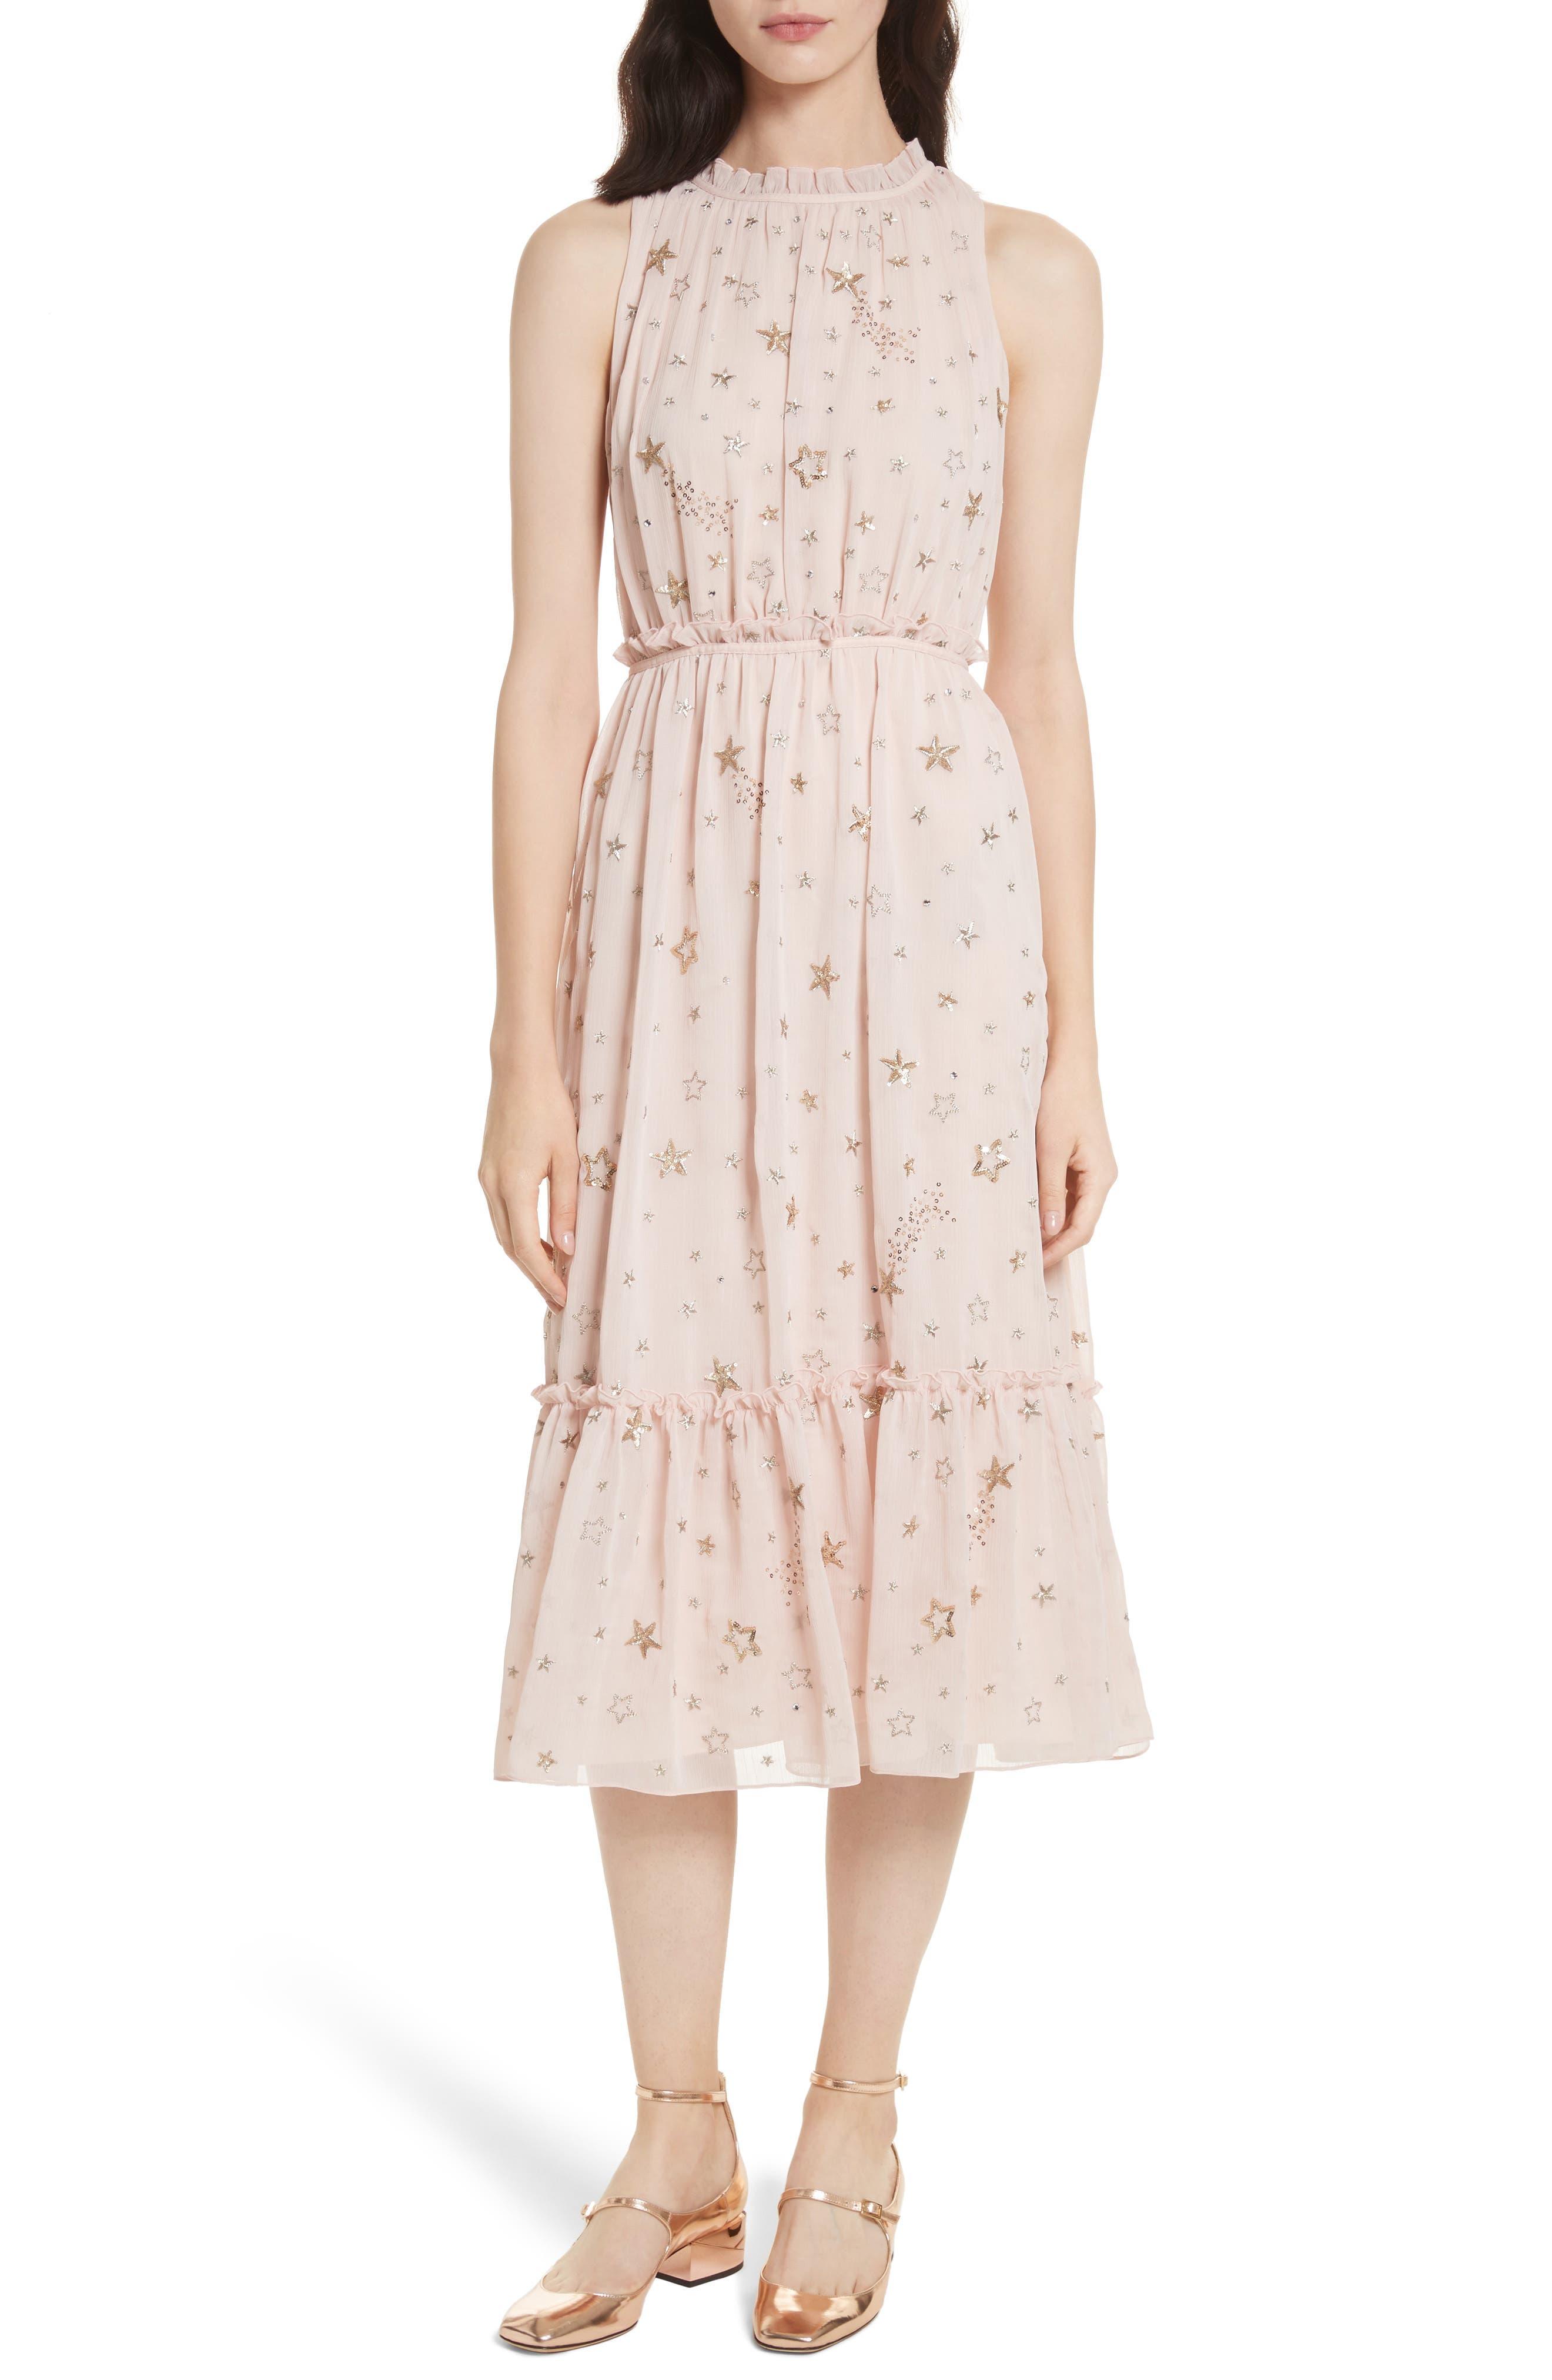 amada embellished midi dress,                             Main thumbnail 1, color,